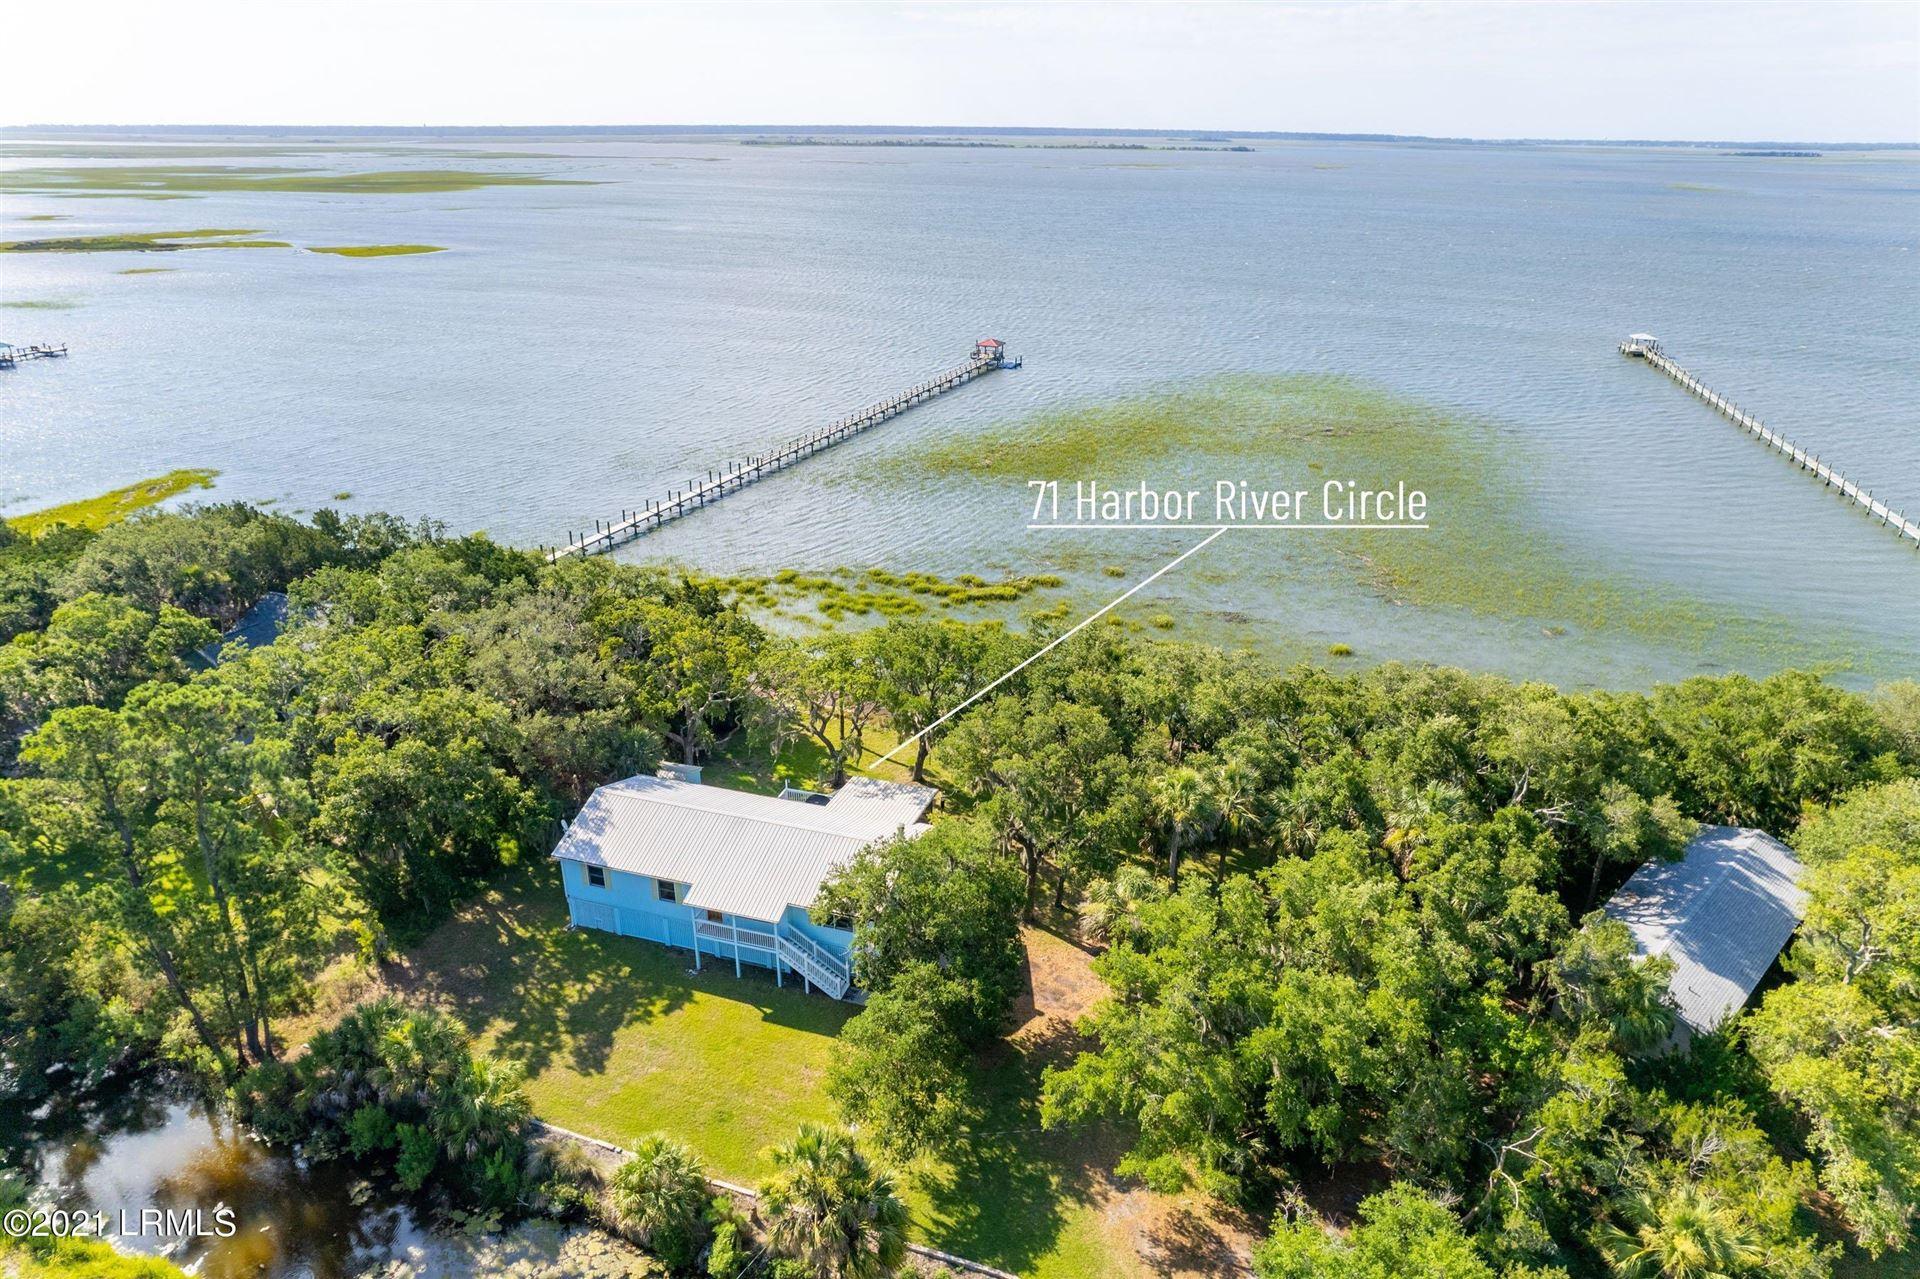 71 Harbor River Circle, Ladys Island, SC 29920 - MLS#: 171812